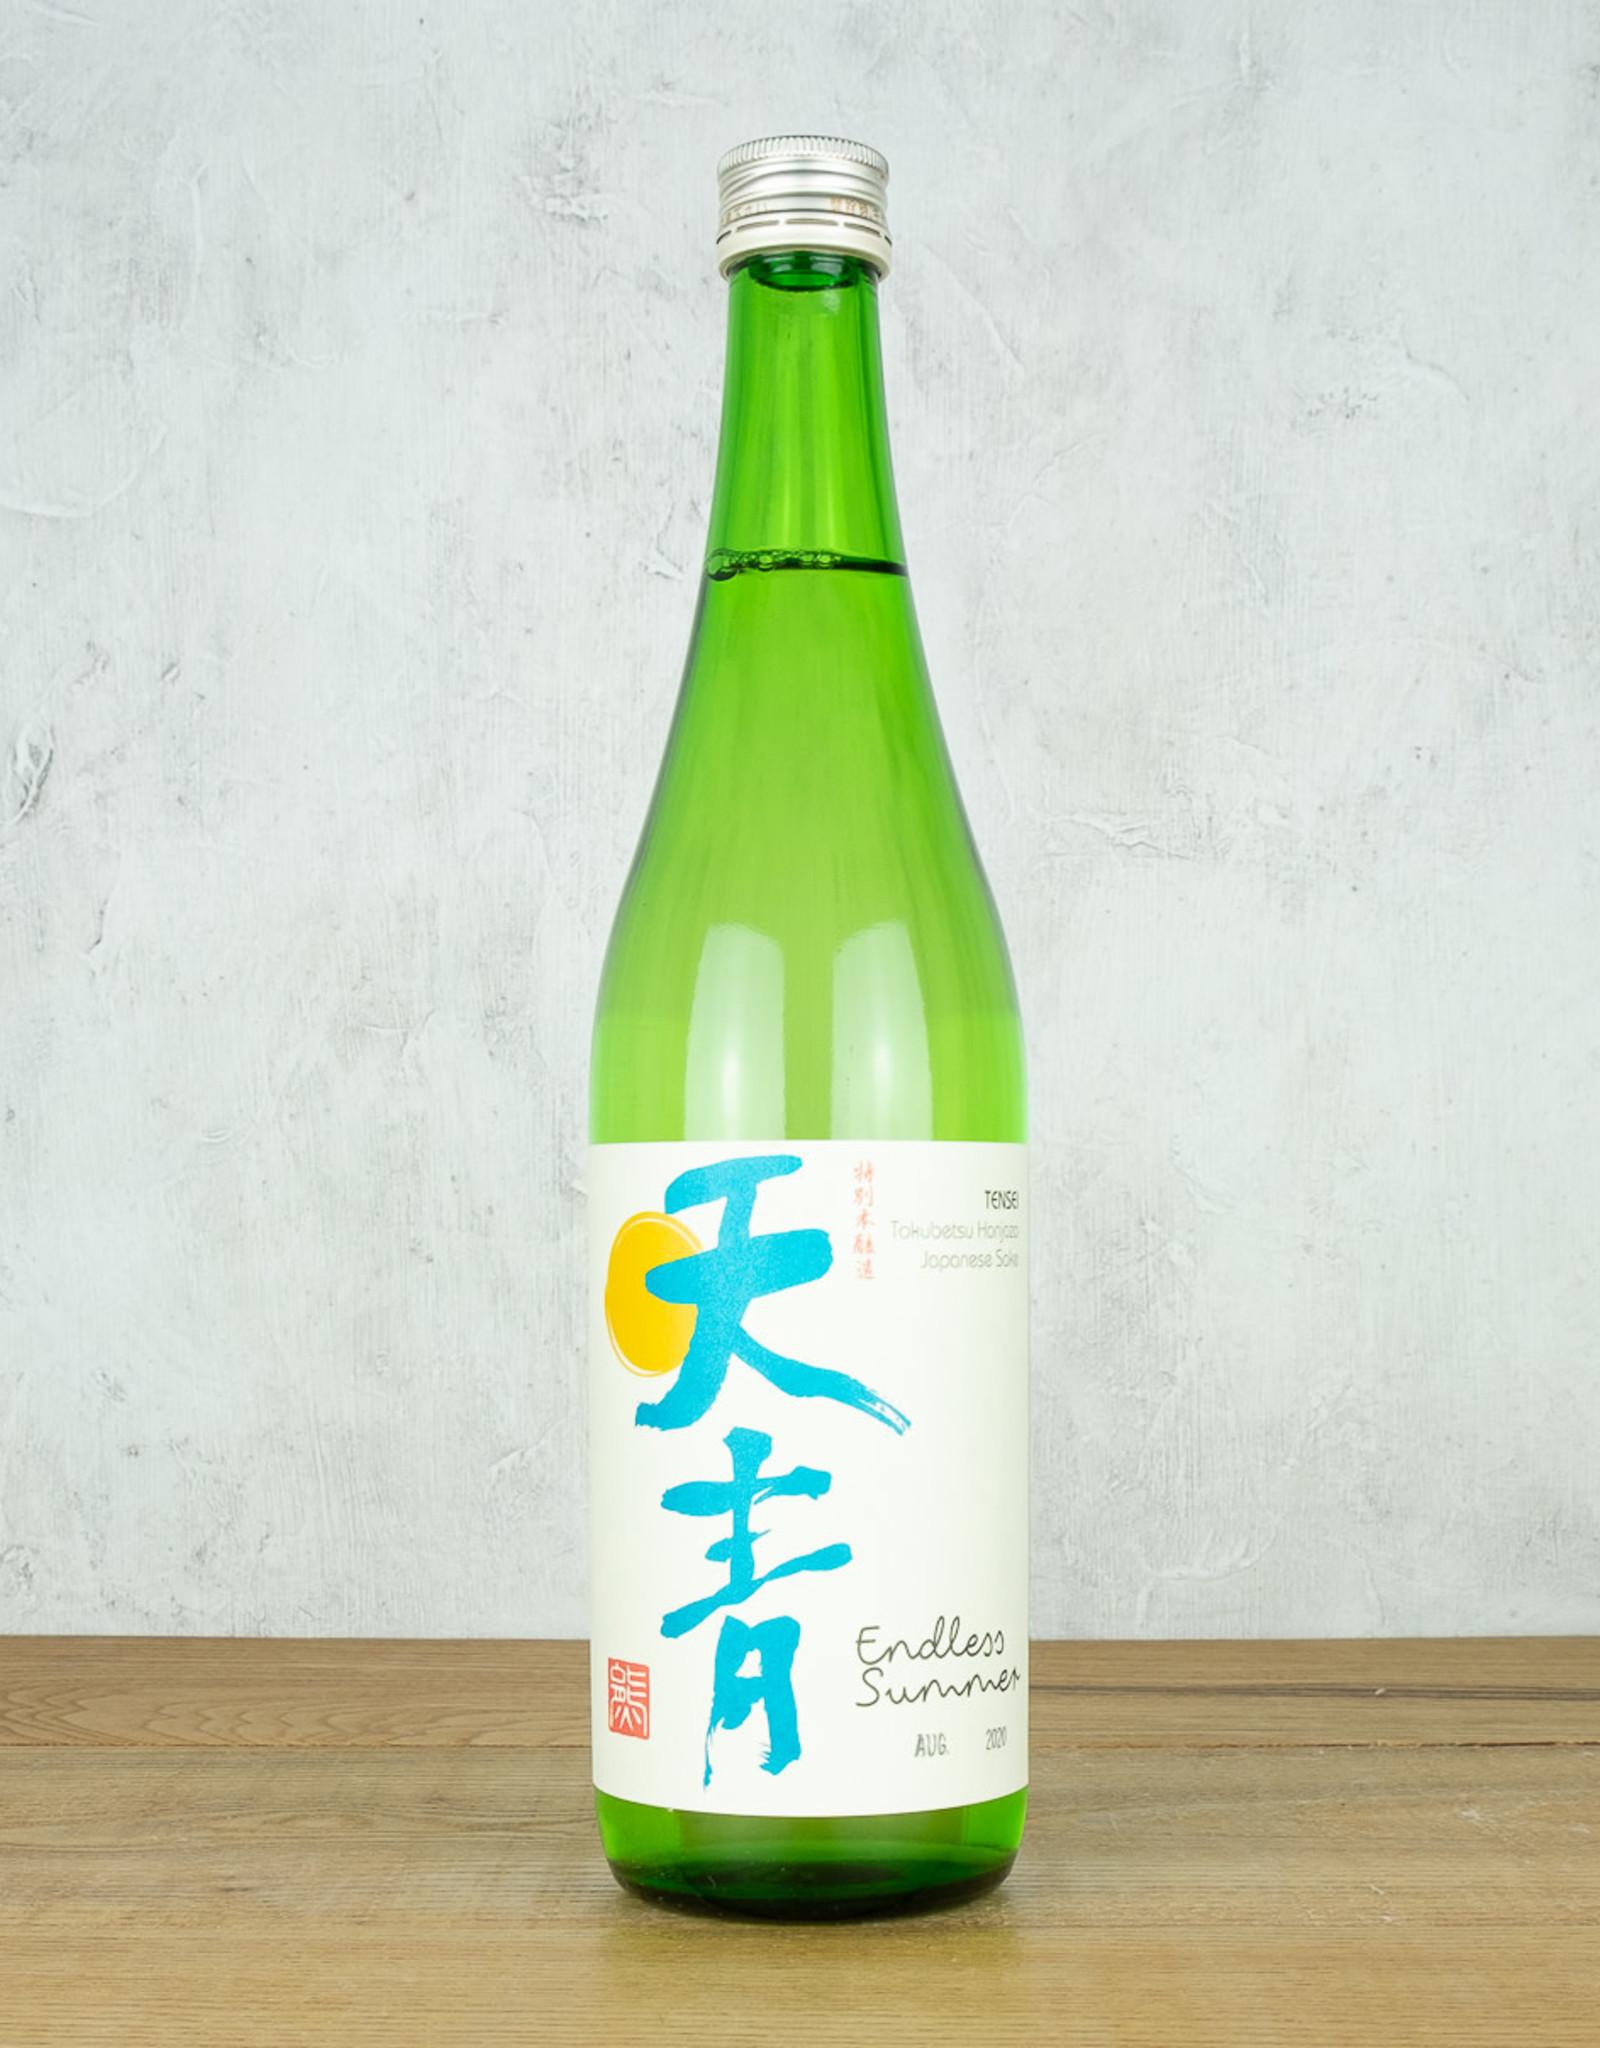 Tensei Sake Endless Summer Tokubetsu Honjozo